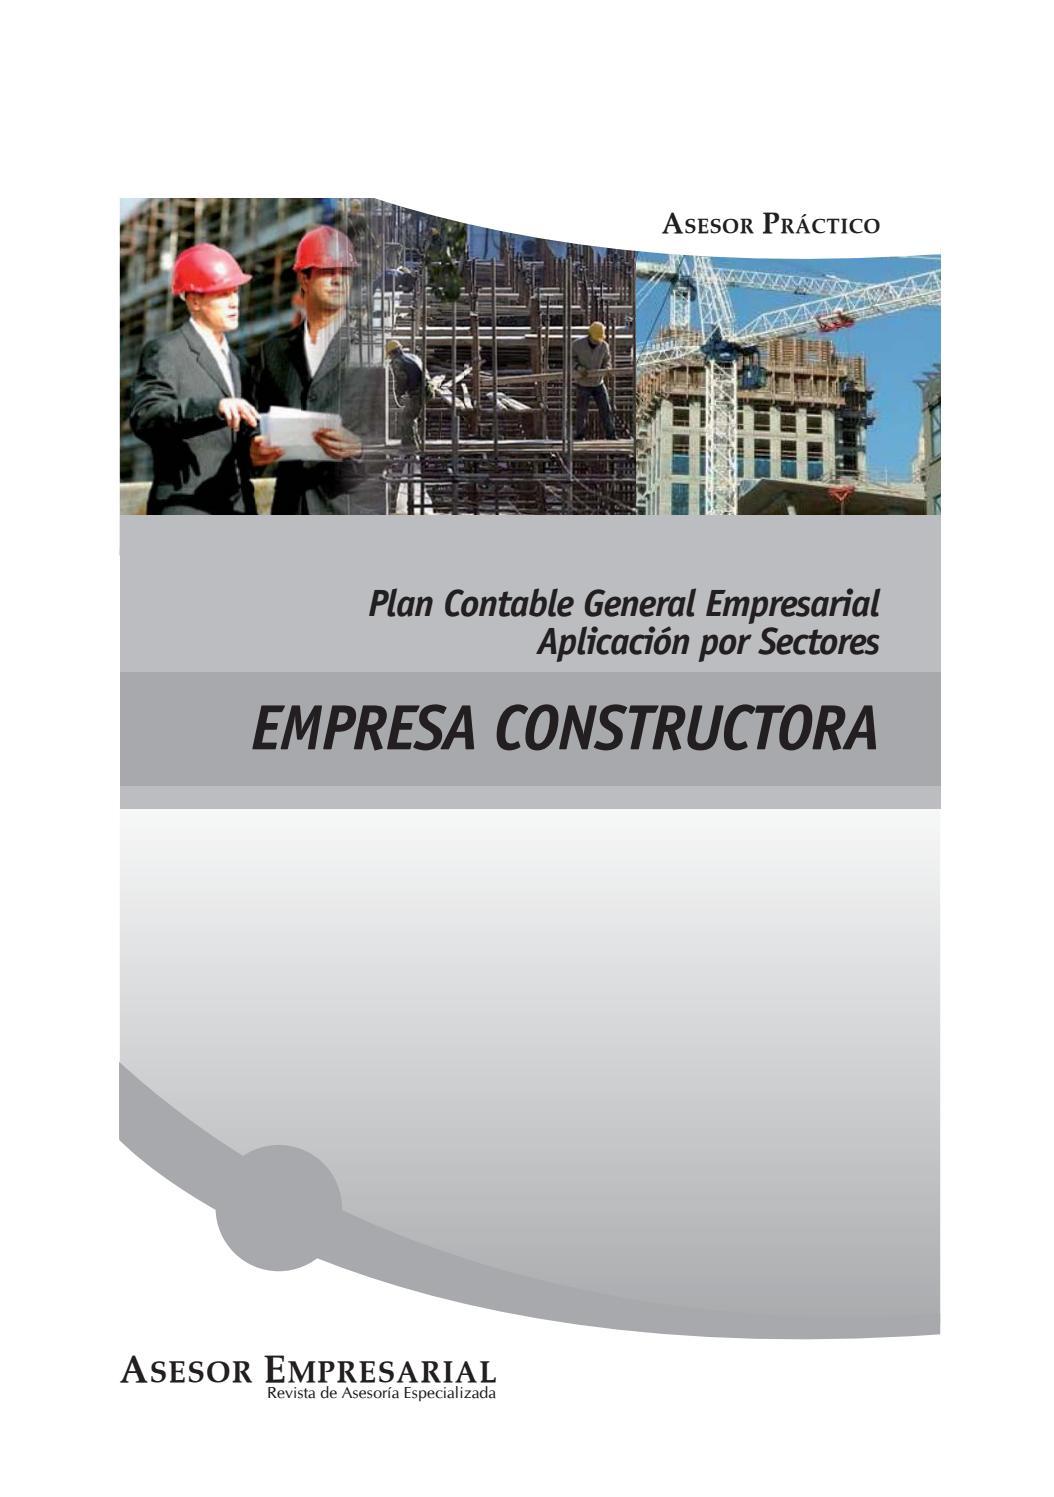 Pcge Empresa Constructora By Johnson Lopez Issuu